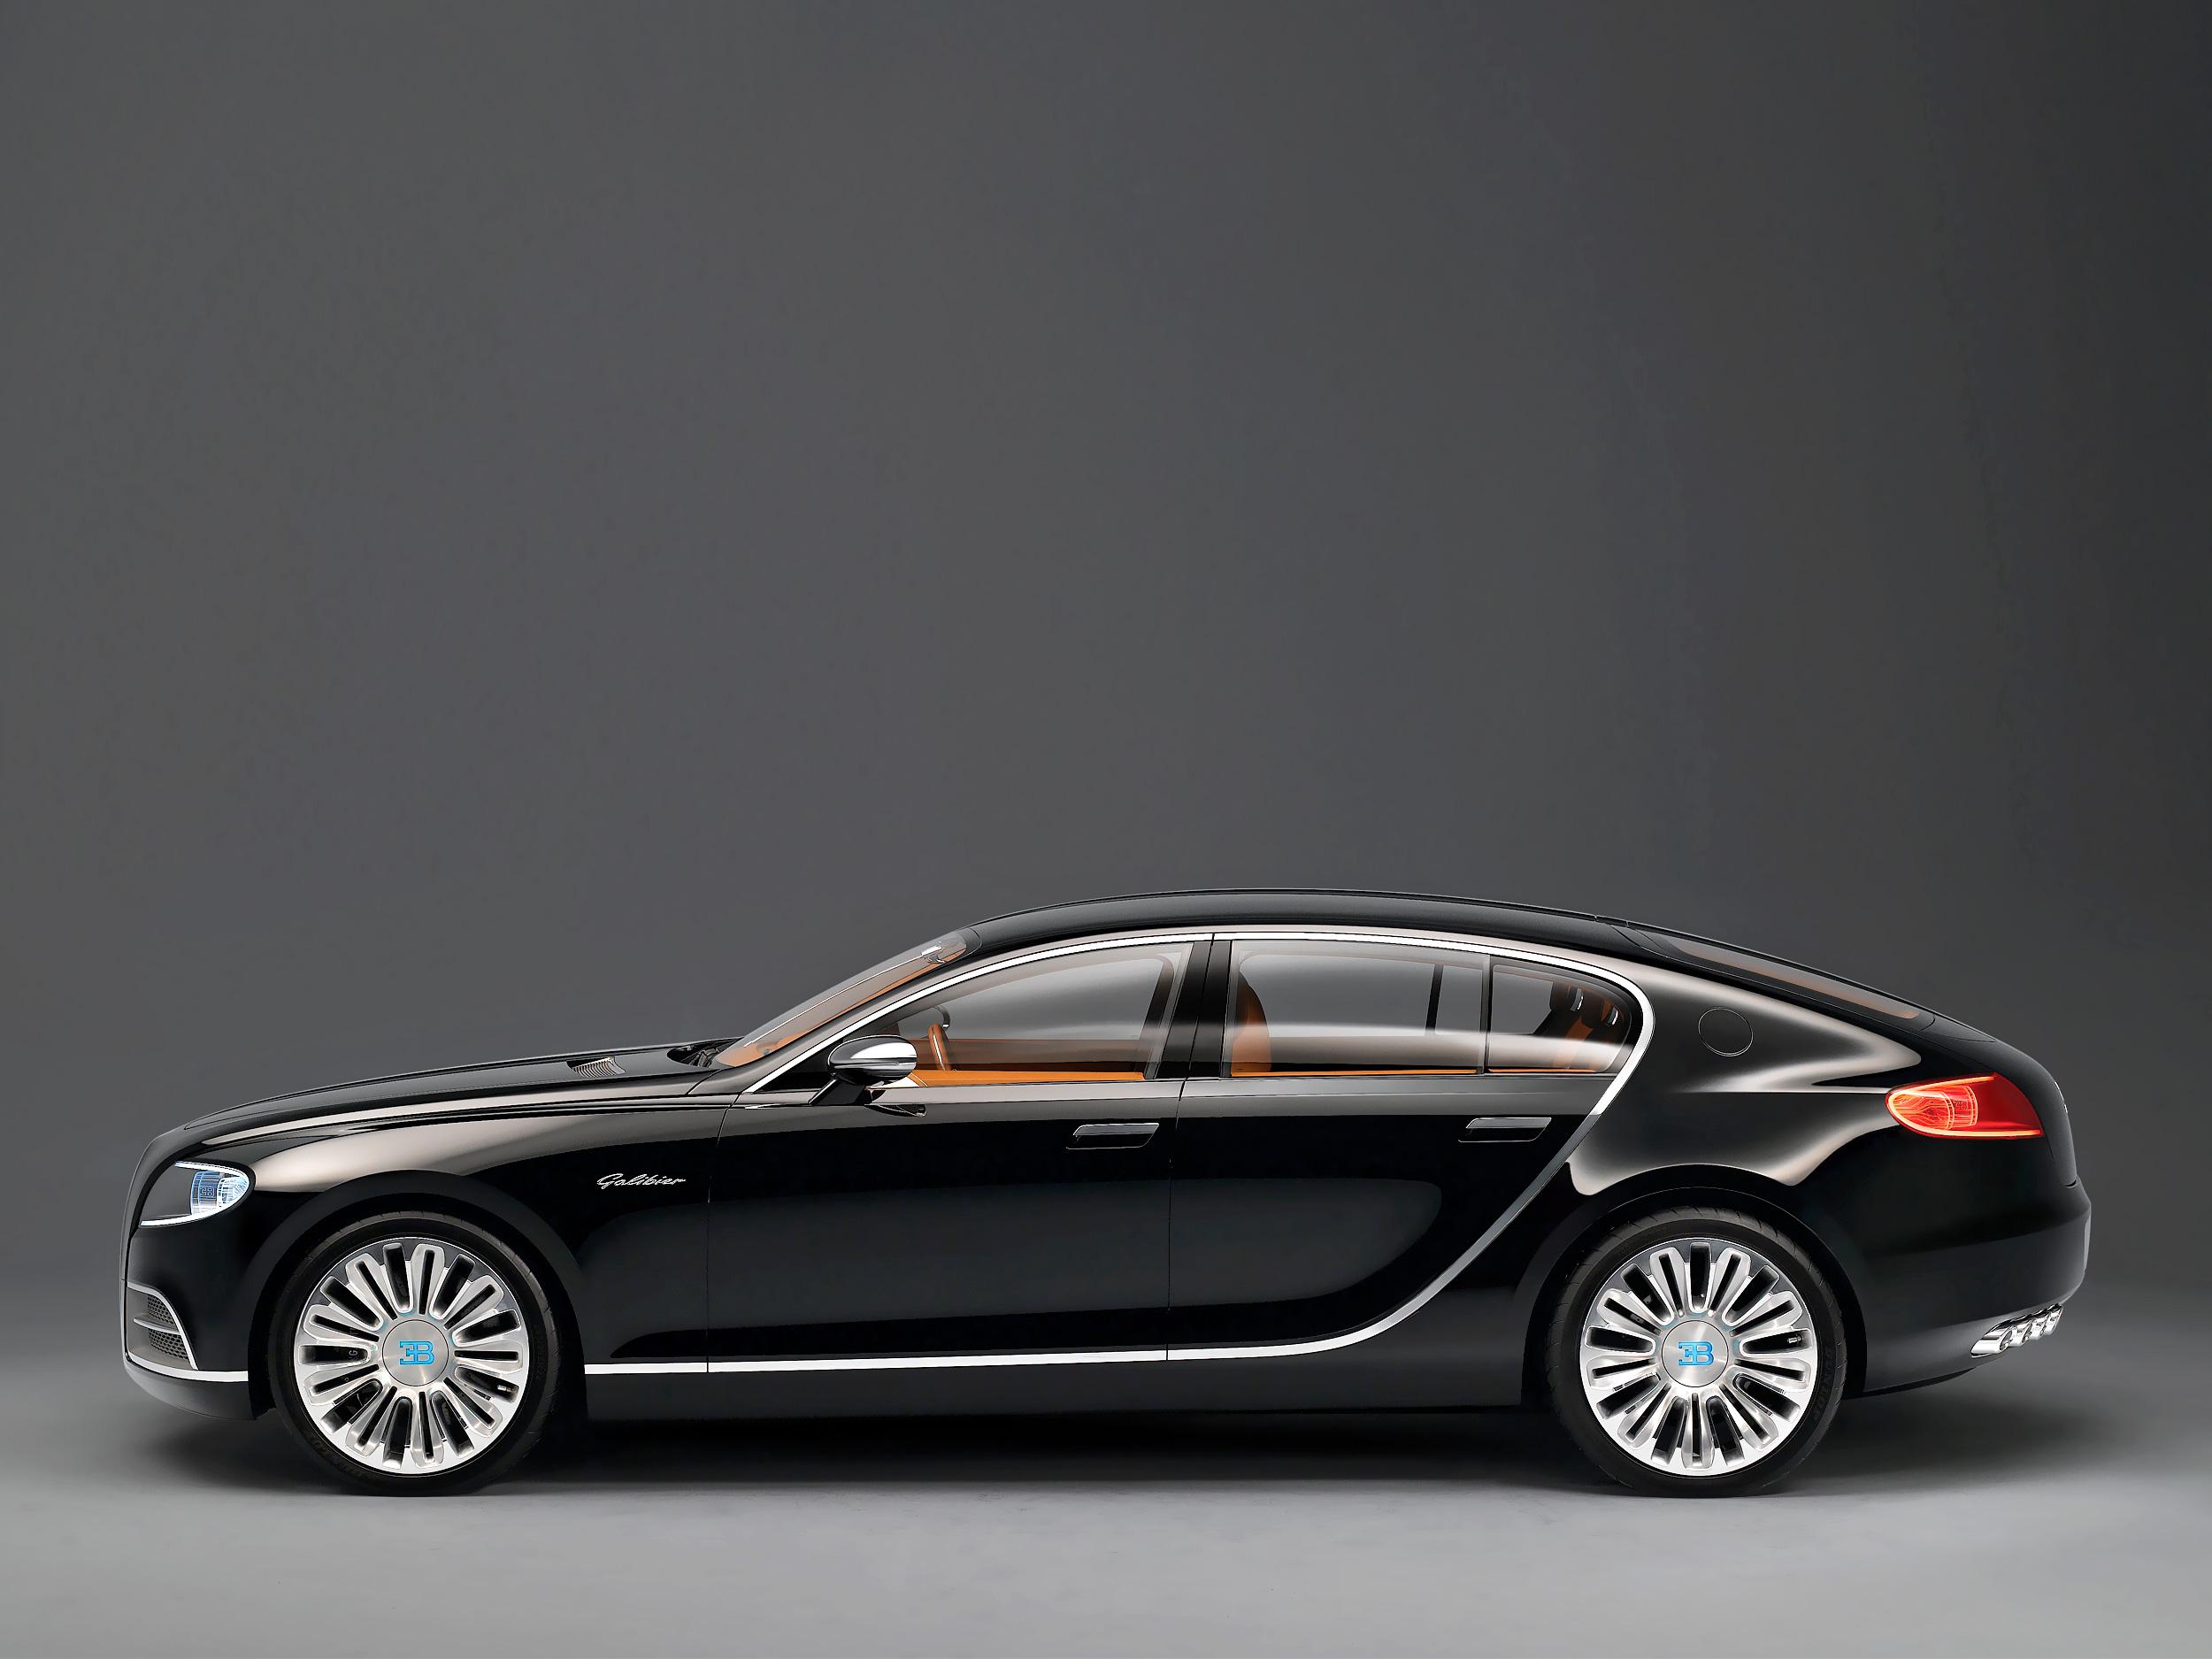 bugatti 16c galibier c galibier price interior and specs. Black Bedroom Furniture Sets. Home Design Ideas